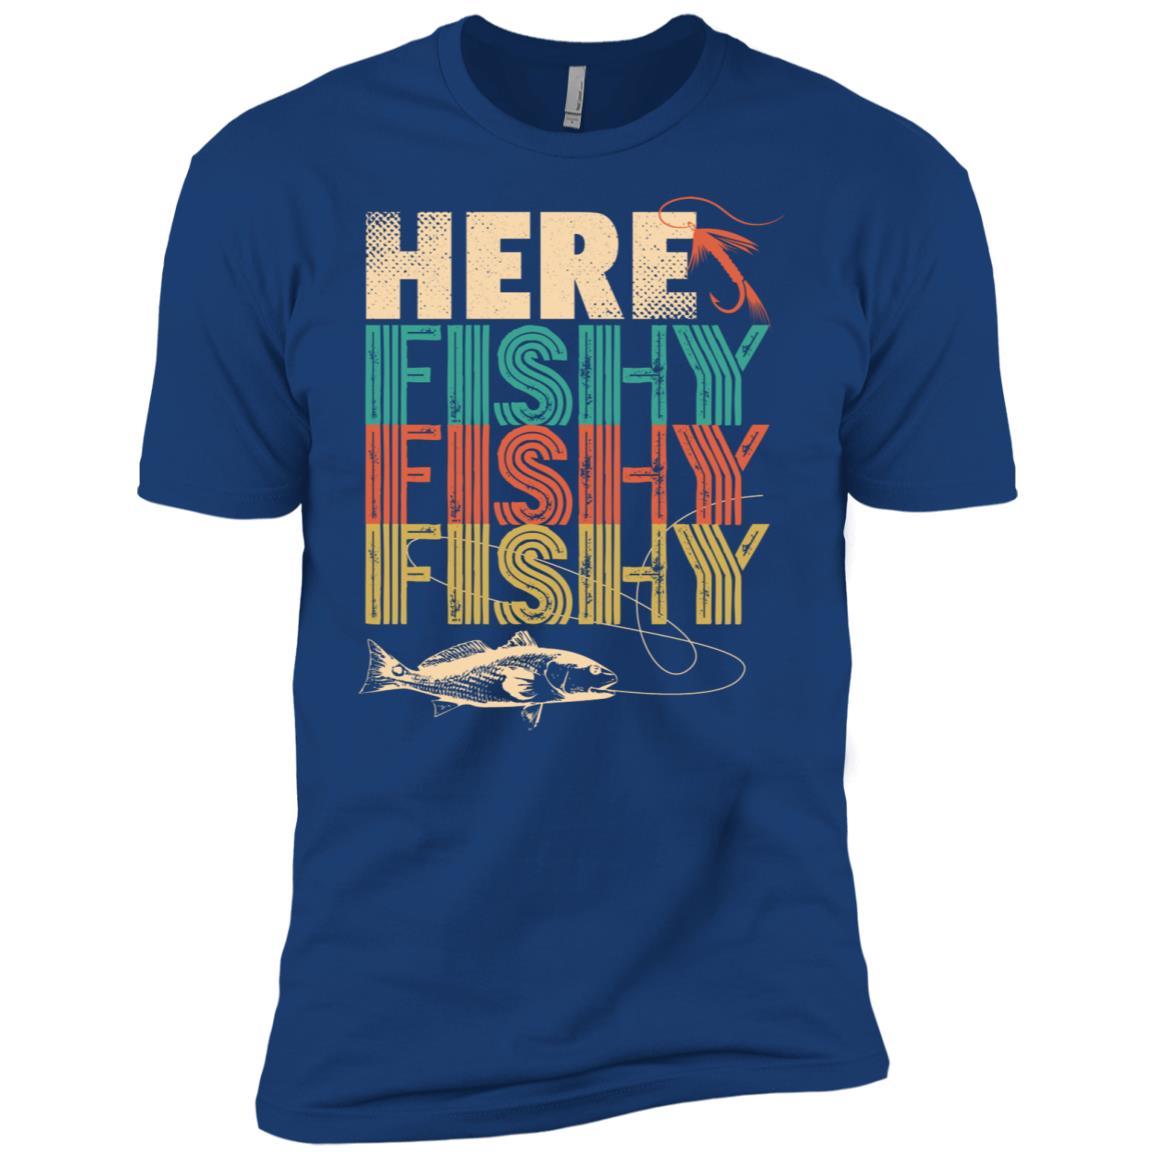 Funny Here Fishy Fishy Fishy Fisherman -4 Men Short Sleeve T-Shirt